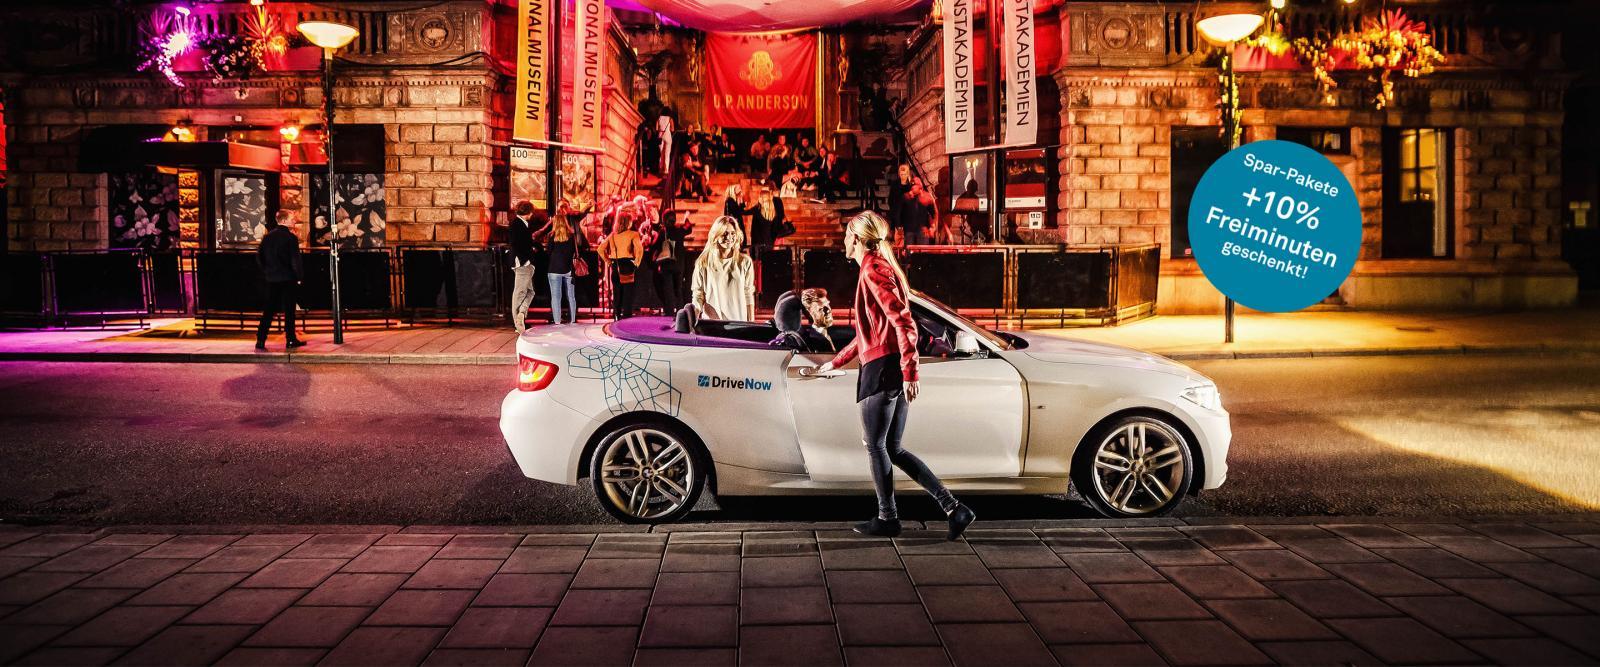 drivenow_carsharing_wien_spar-pakete